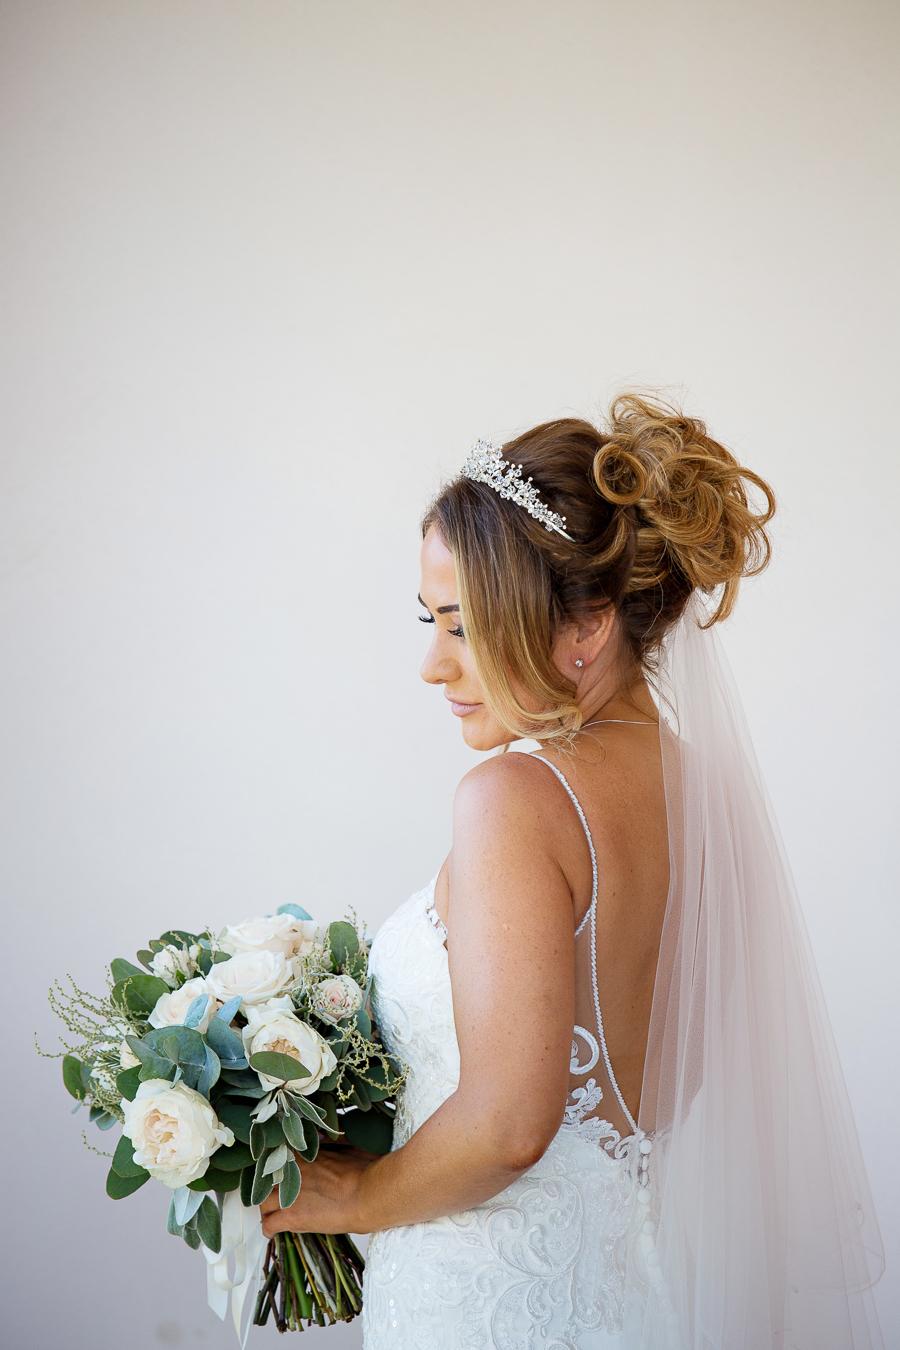 Stacy & Darren's romantic Algarve wedding, with Martin Dabek Photography (12)